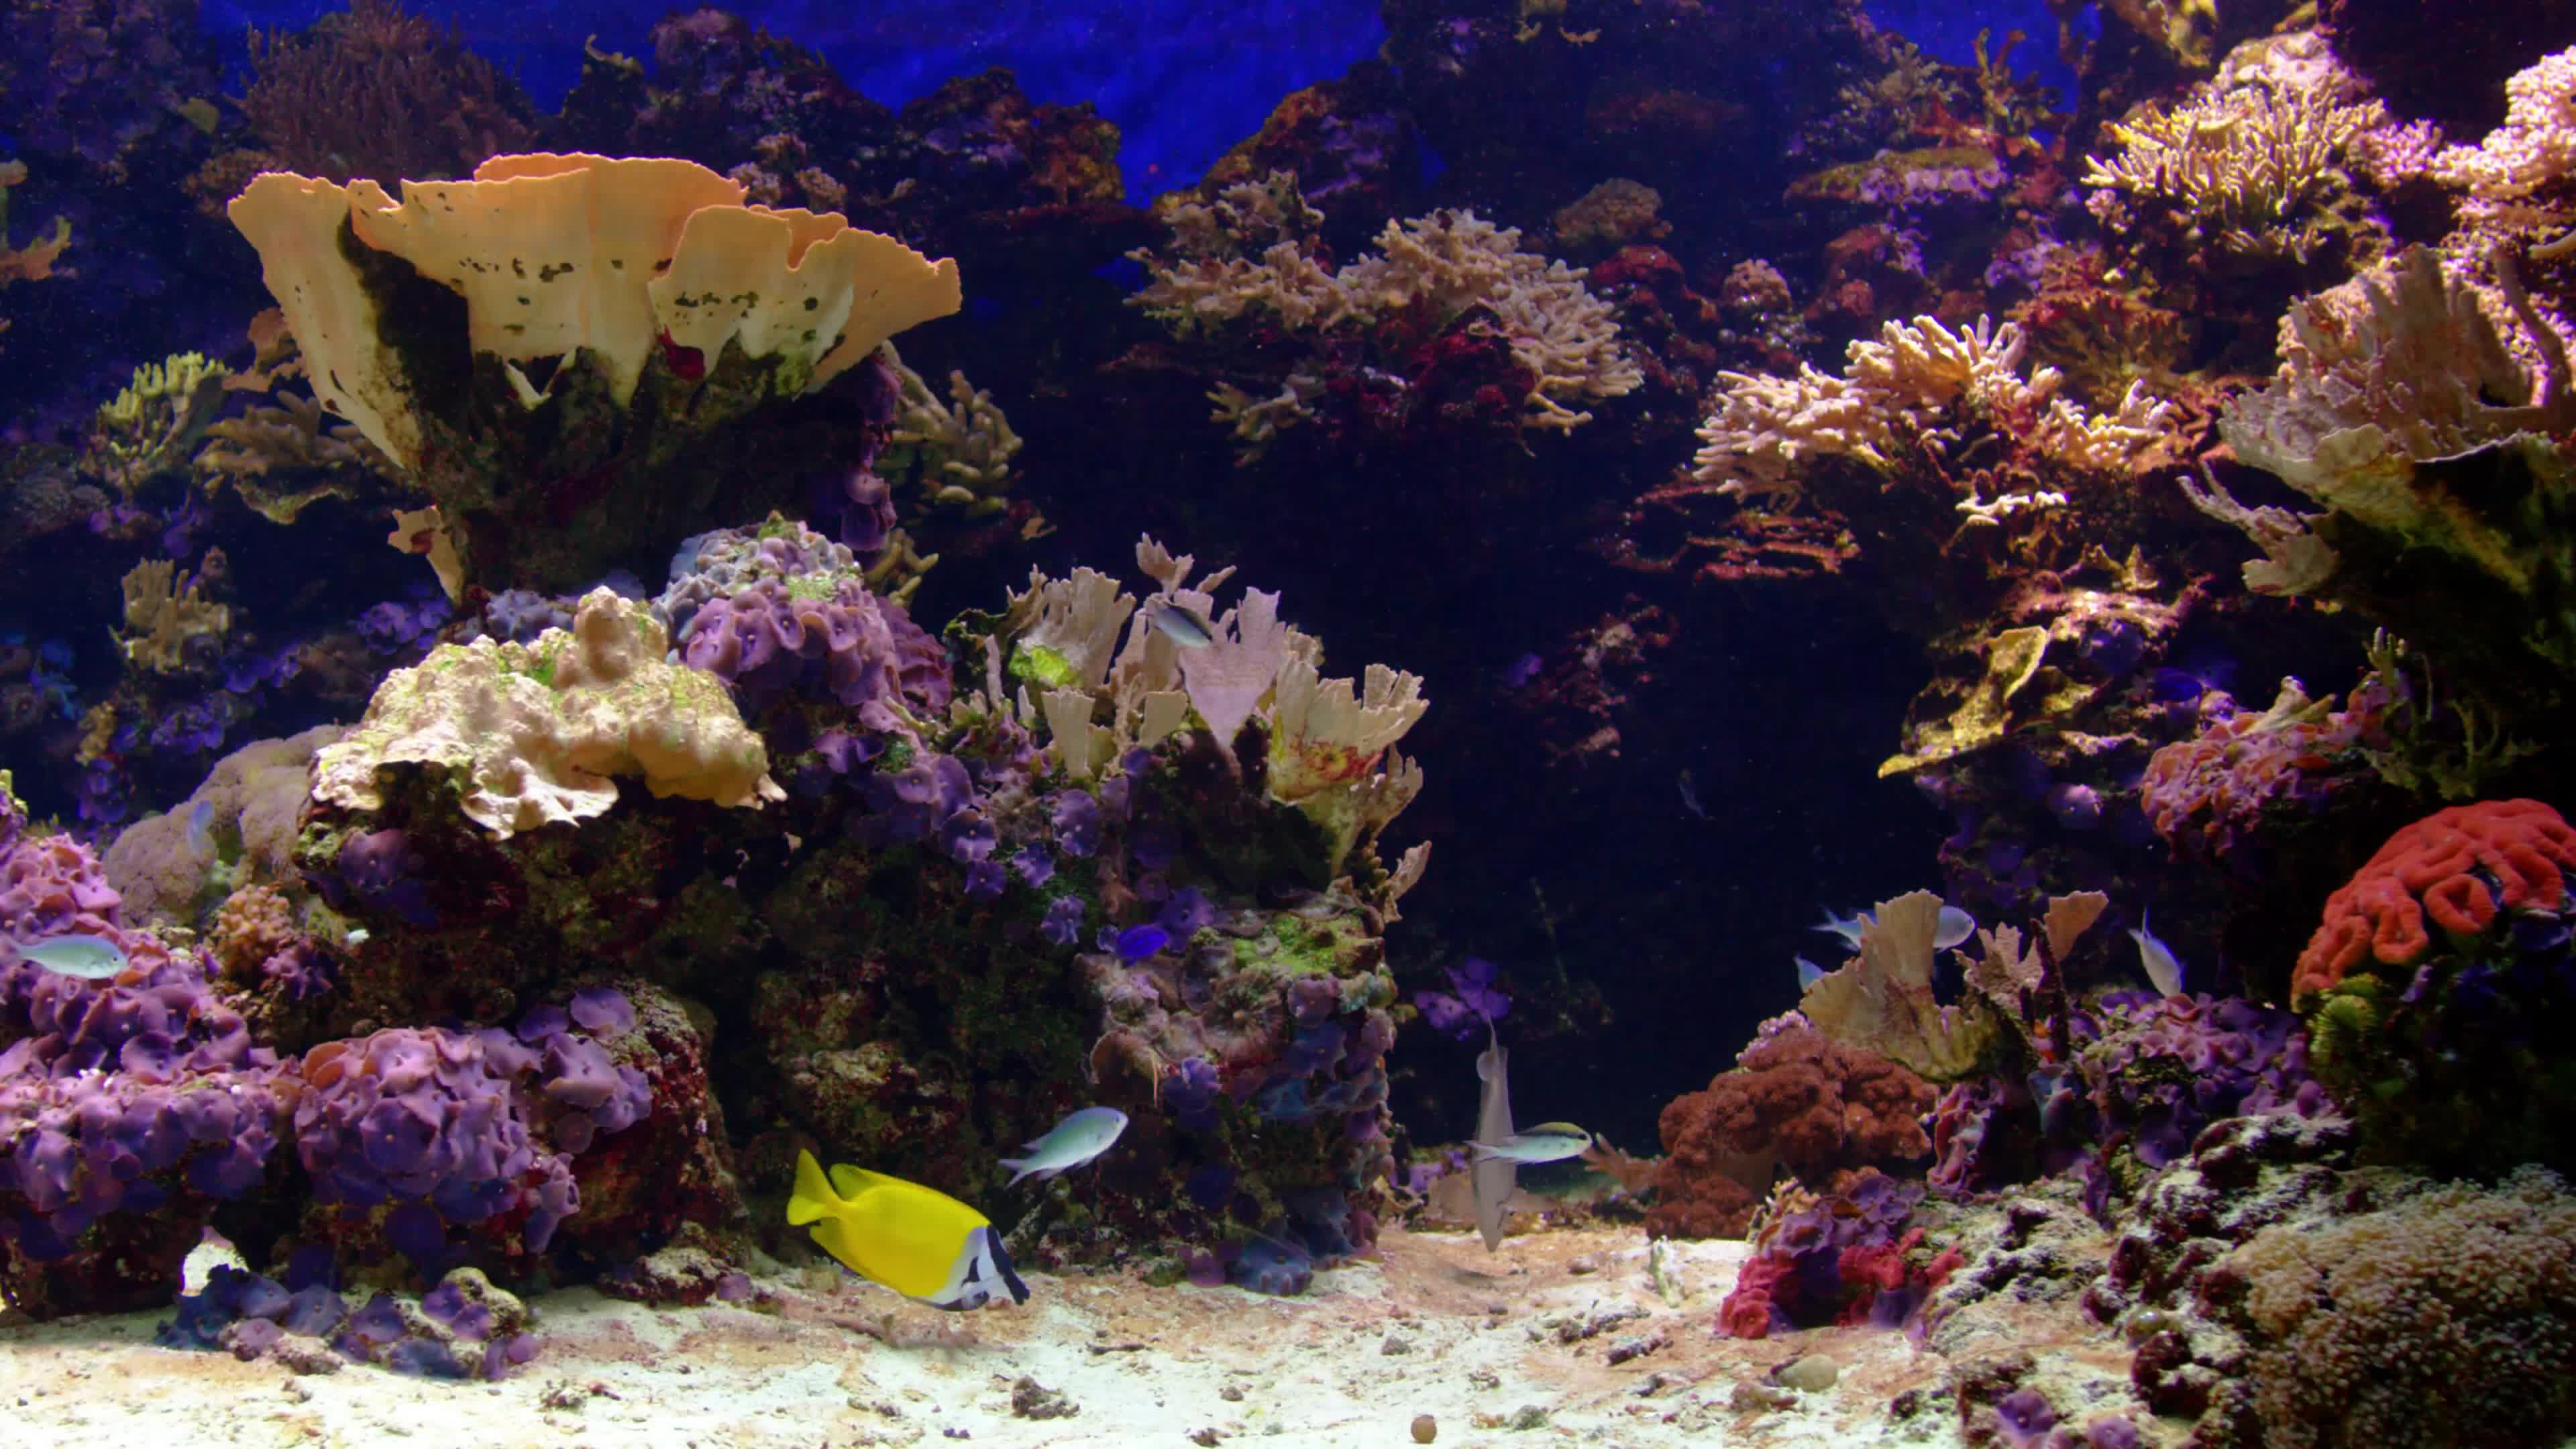 4k Fish Wallpaper Fish 2 Gifs Coral Reef 1857753 Hd Wallpaper Backgrounds Download